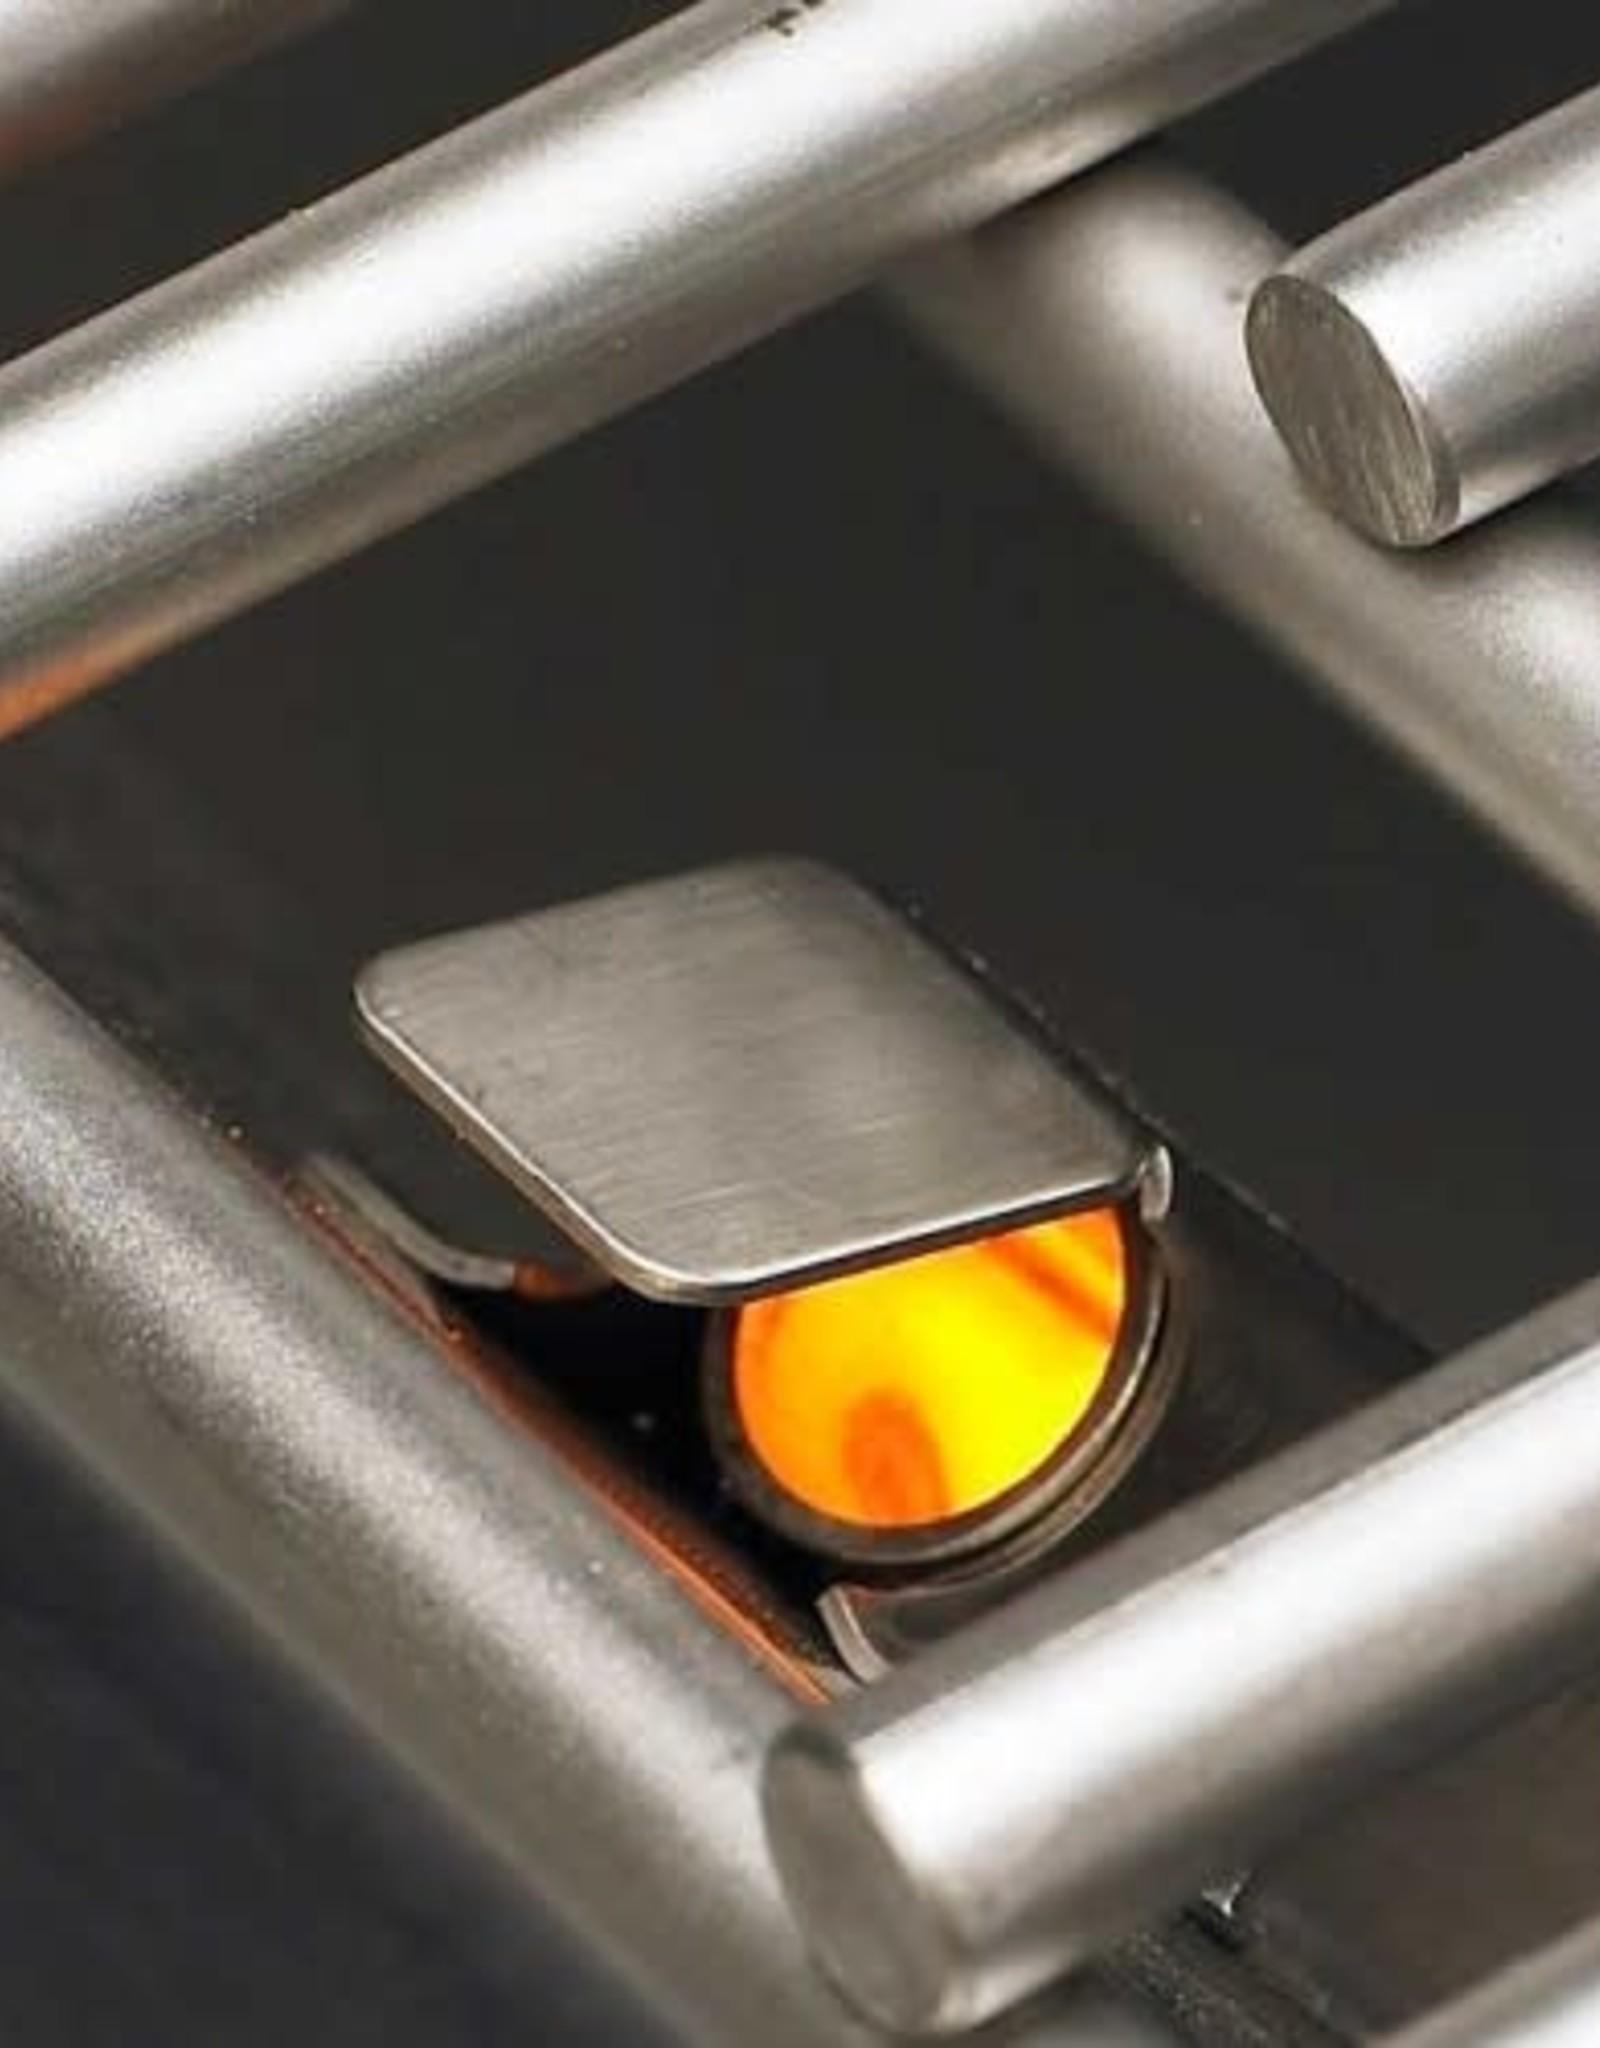 Fire Magic Fire Magic - Echelon Diamond E790s 36-inch Portable Grill with Single Side Burner (Analog)